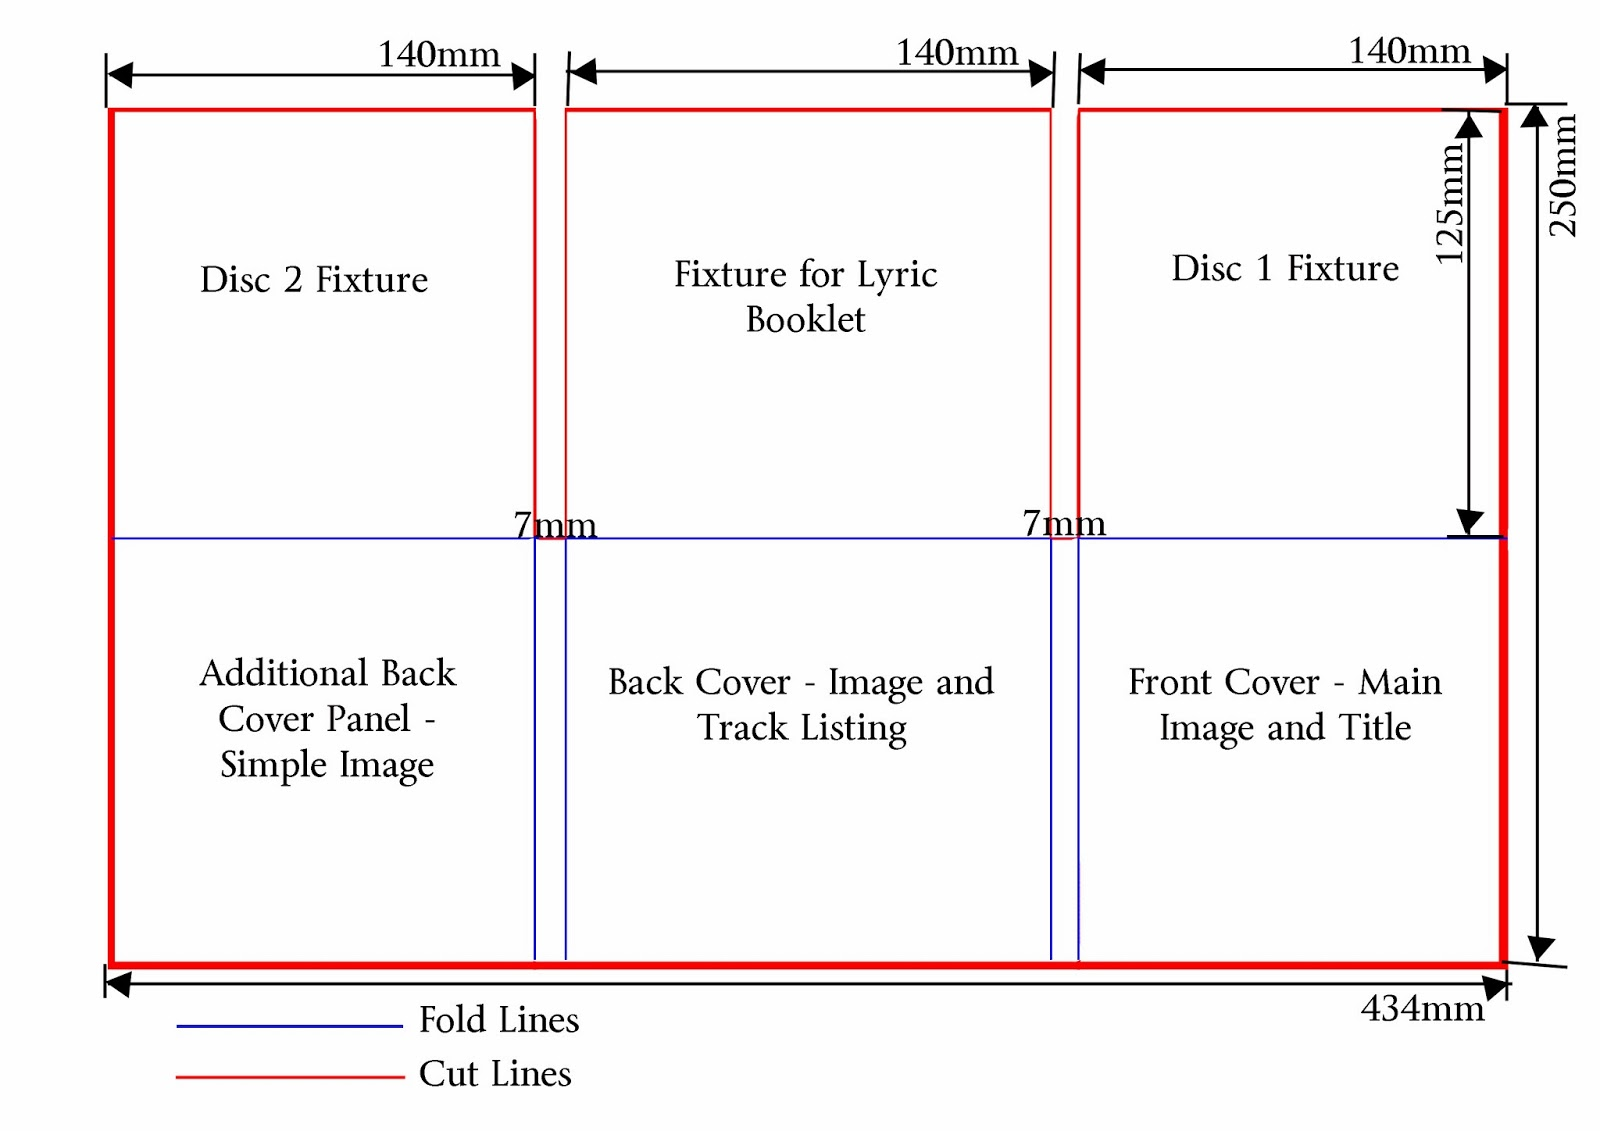 lauren barrett 5136 g324 advanced portfolio digipak skeleton layouts. Black Bedroom Furniture Sets. Home Design Ideas